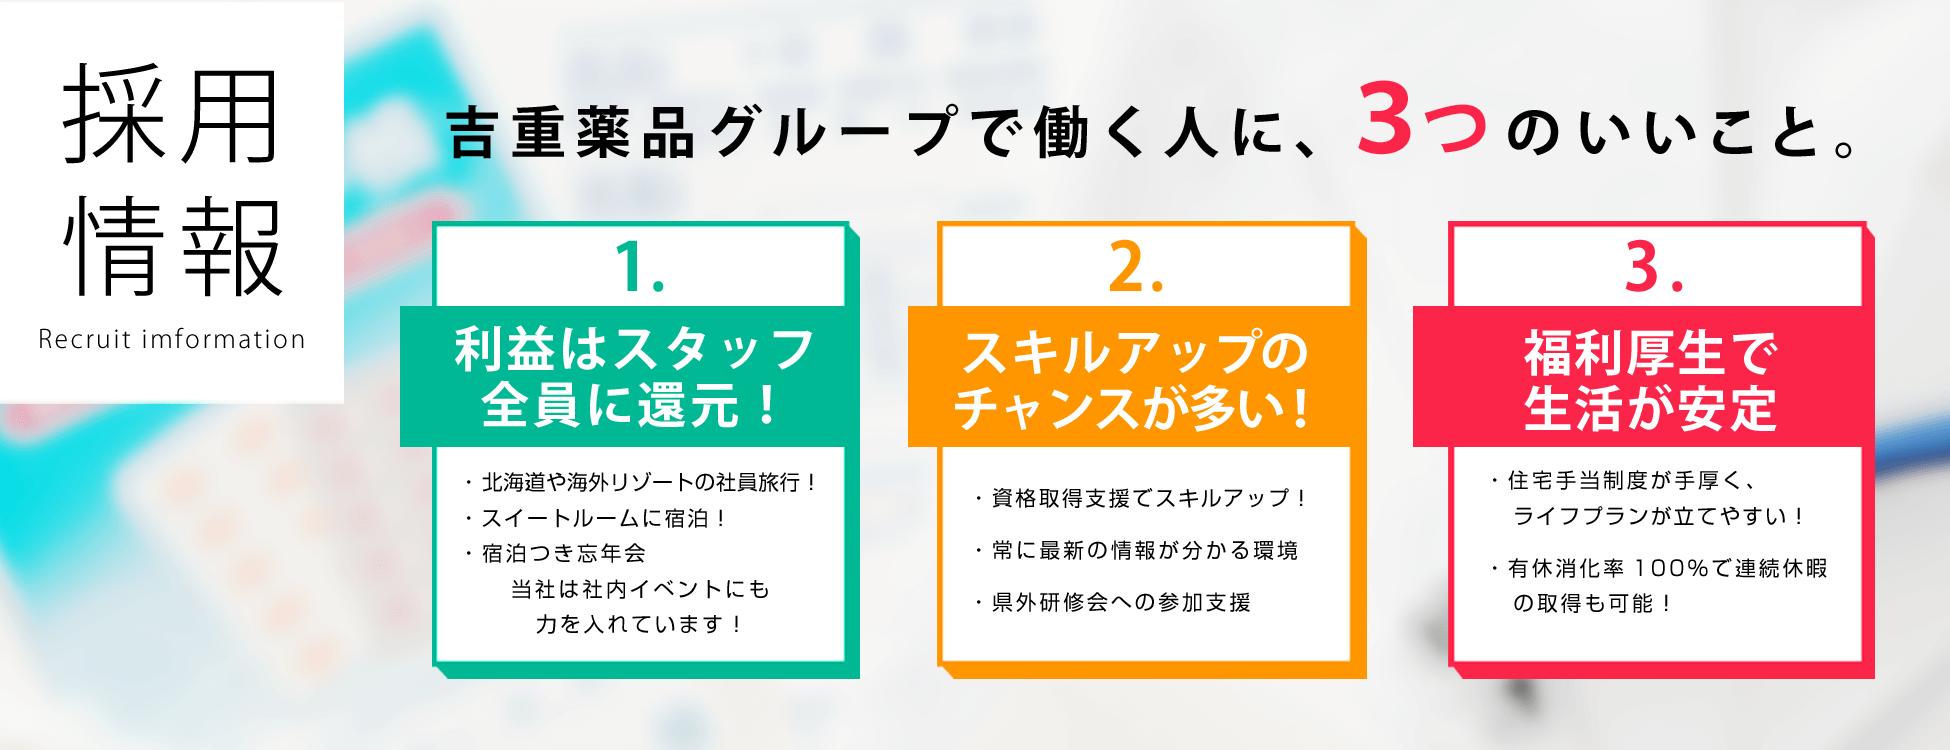 採用情報3.png